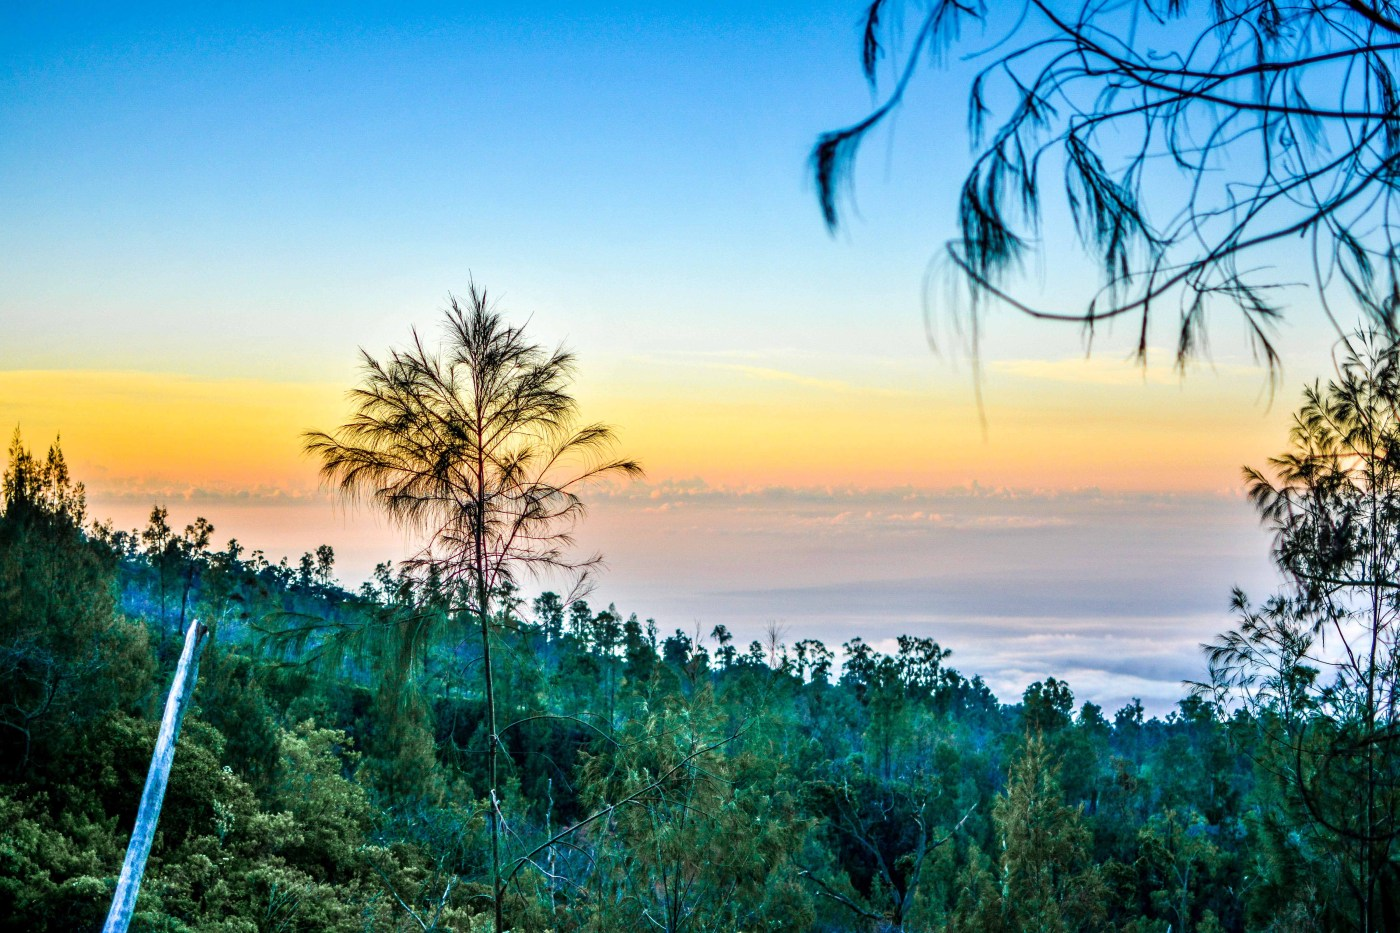 Kawah Ijen Java KawahIjen indonésie porteurs de souffre icietlabas blogvoyage blog voyage